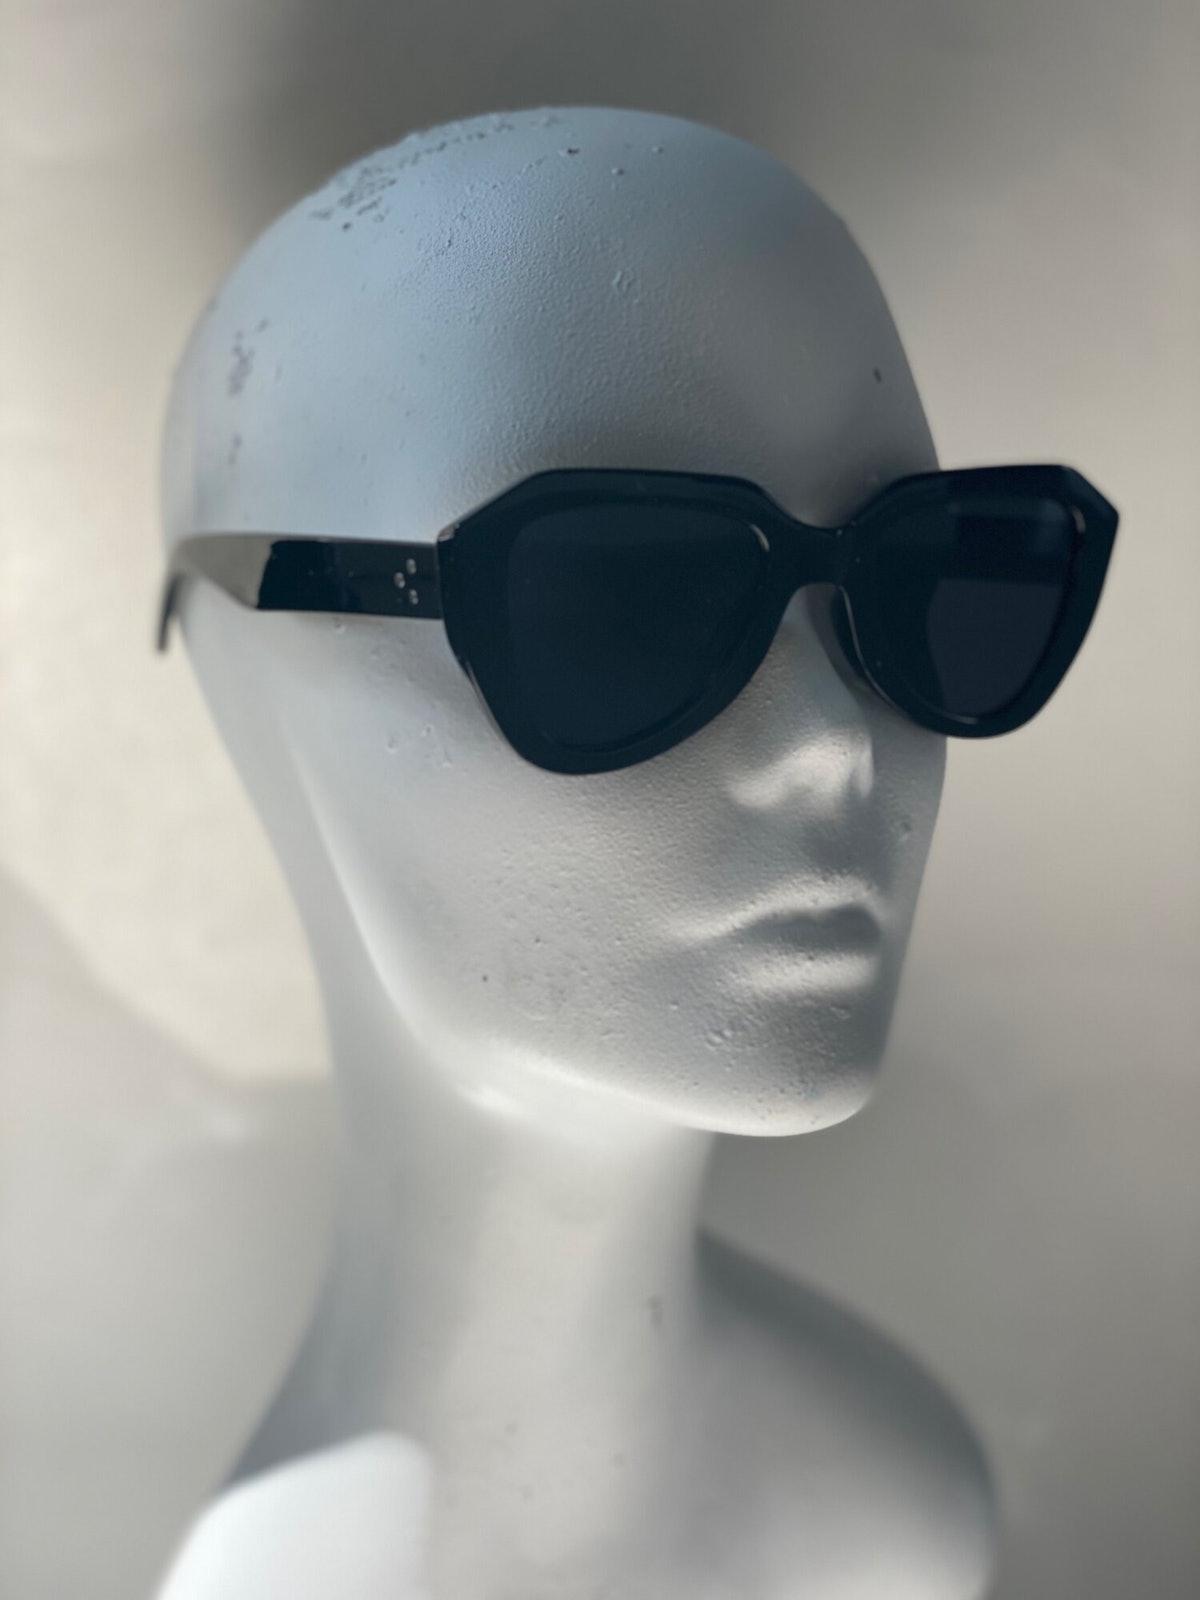 David Rose from 'Schitt's Creek' loves bold sunglasses.